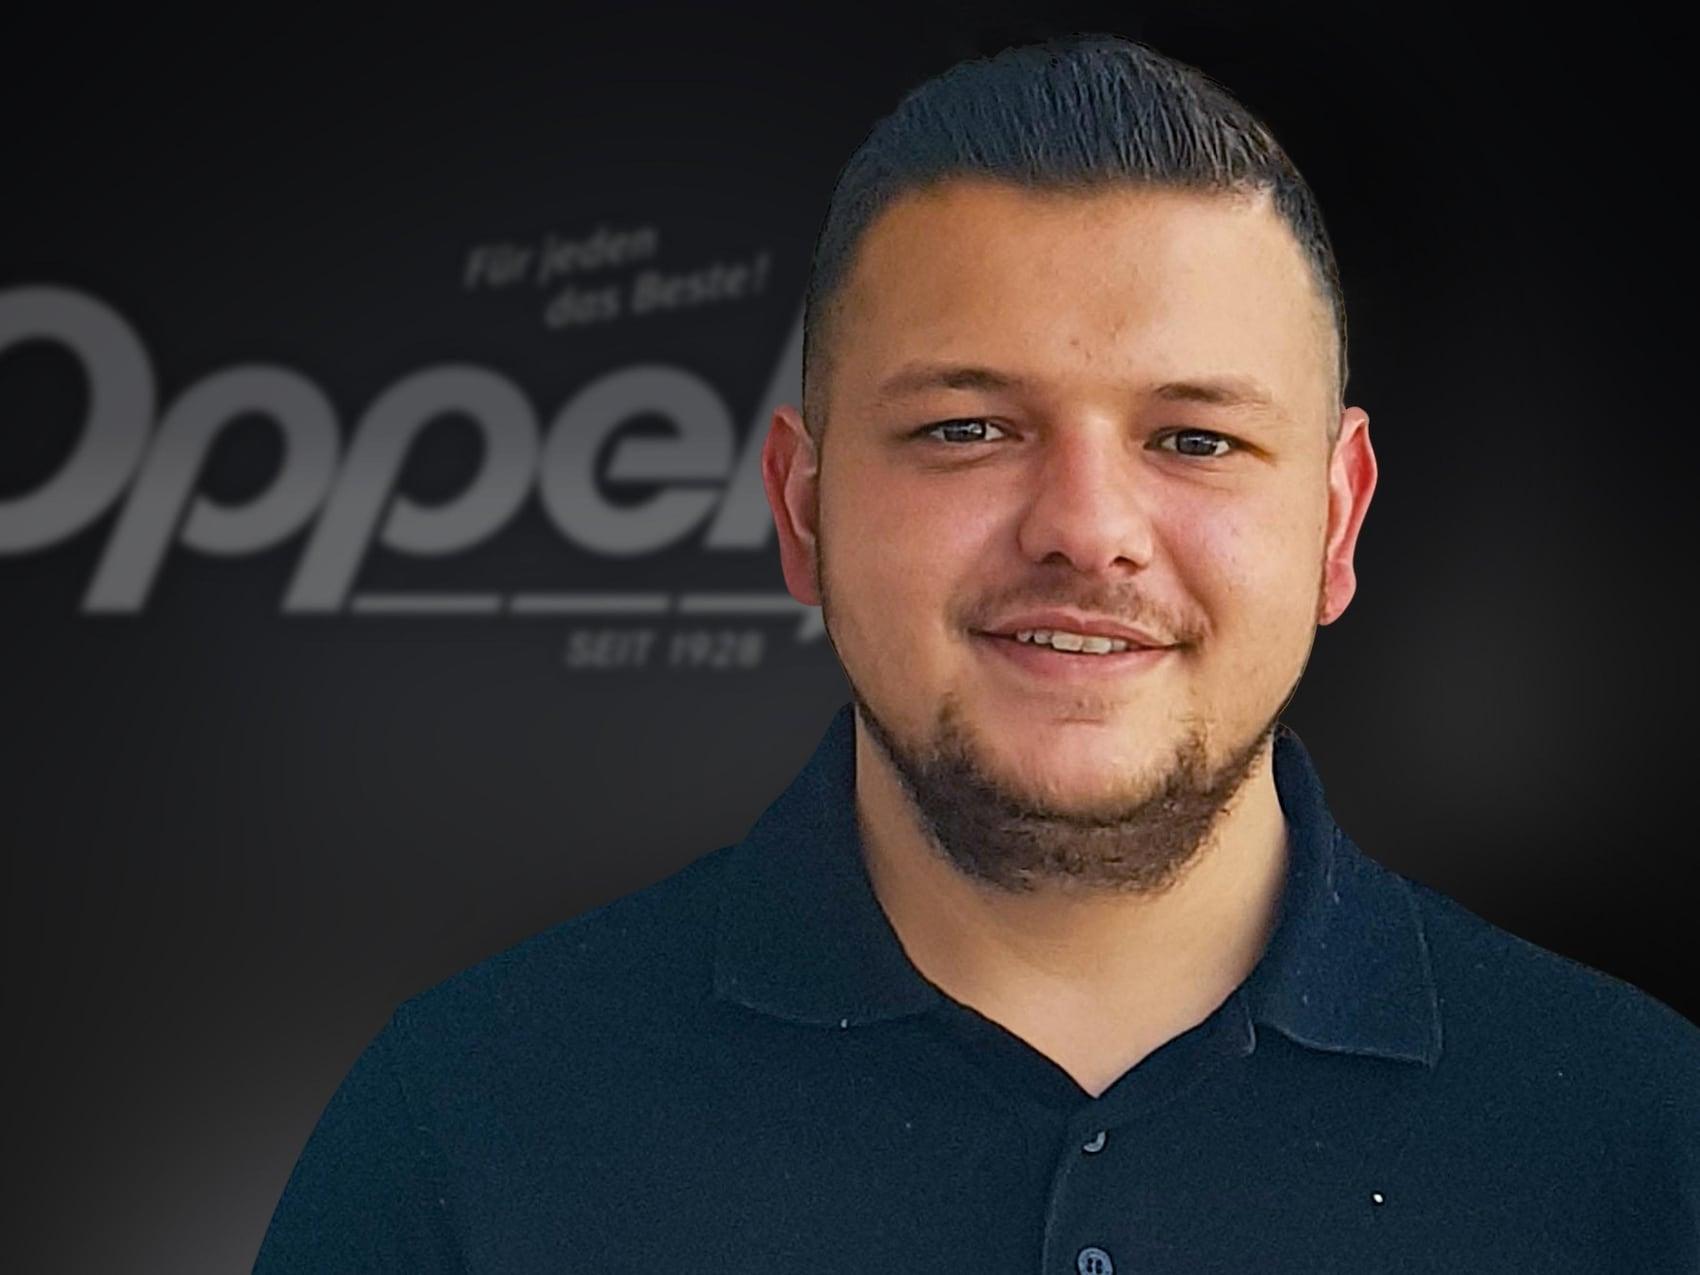 team-sSP-Oppel-GmbH-Plauen-Maghazehei-Fabian